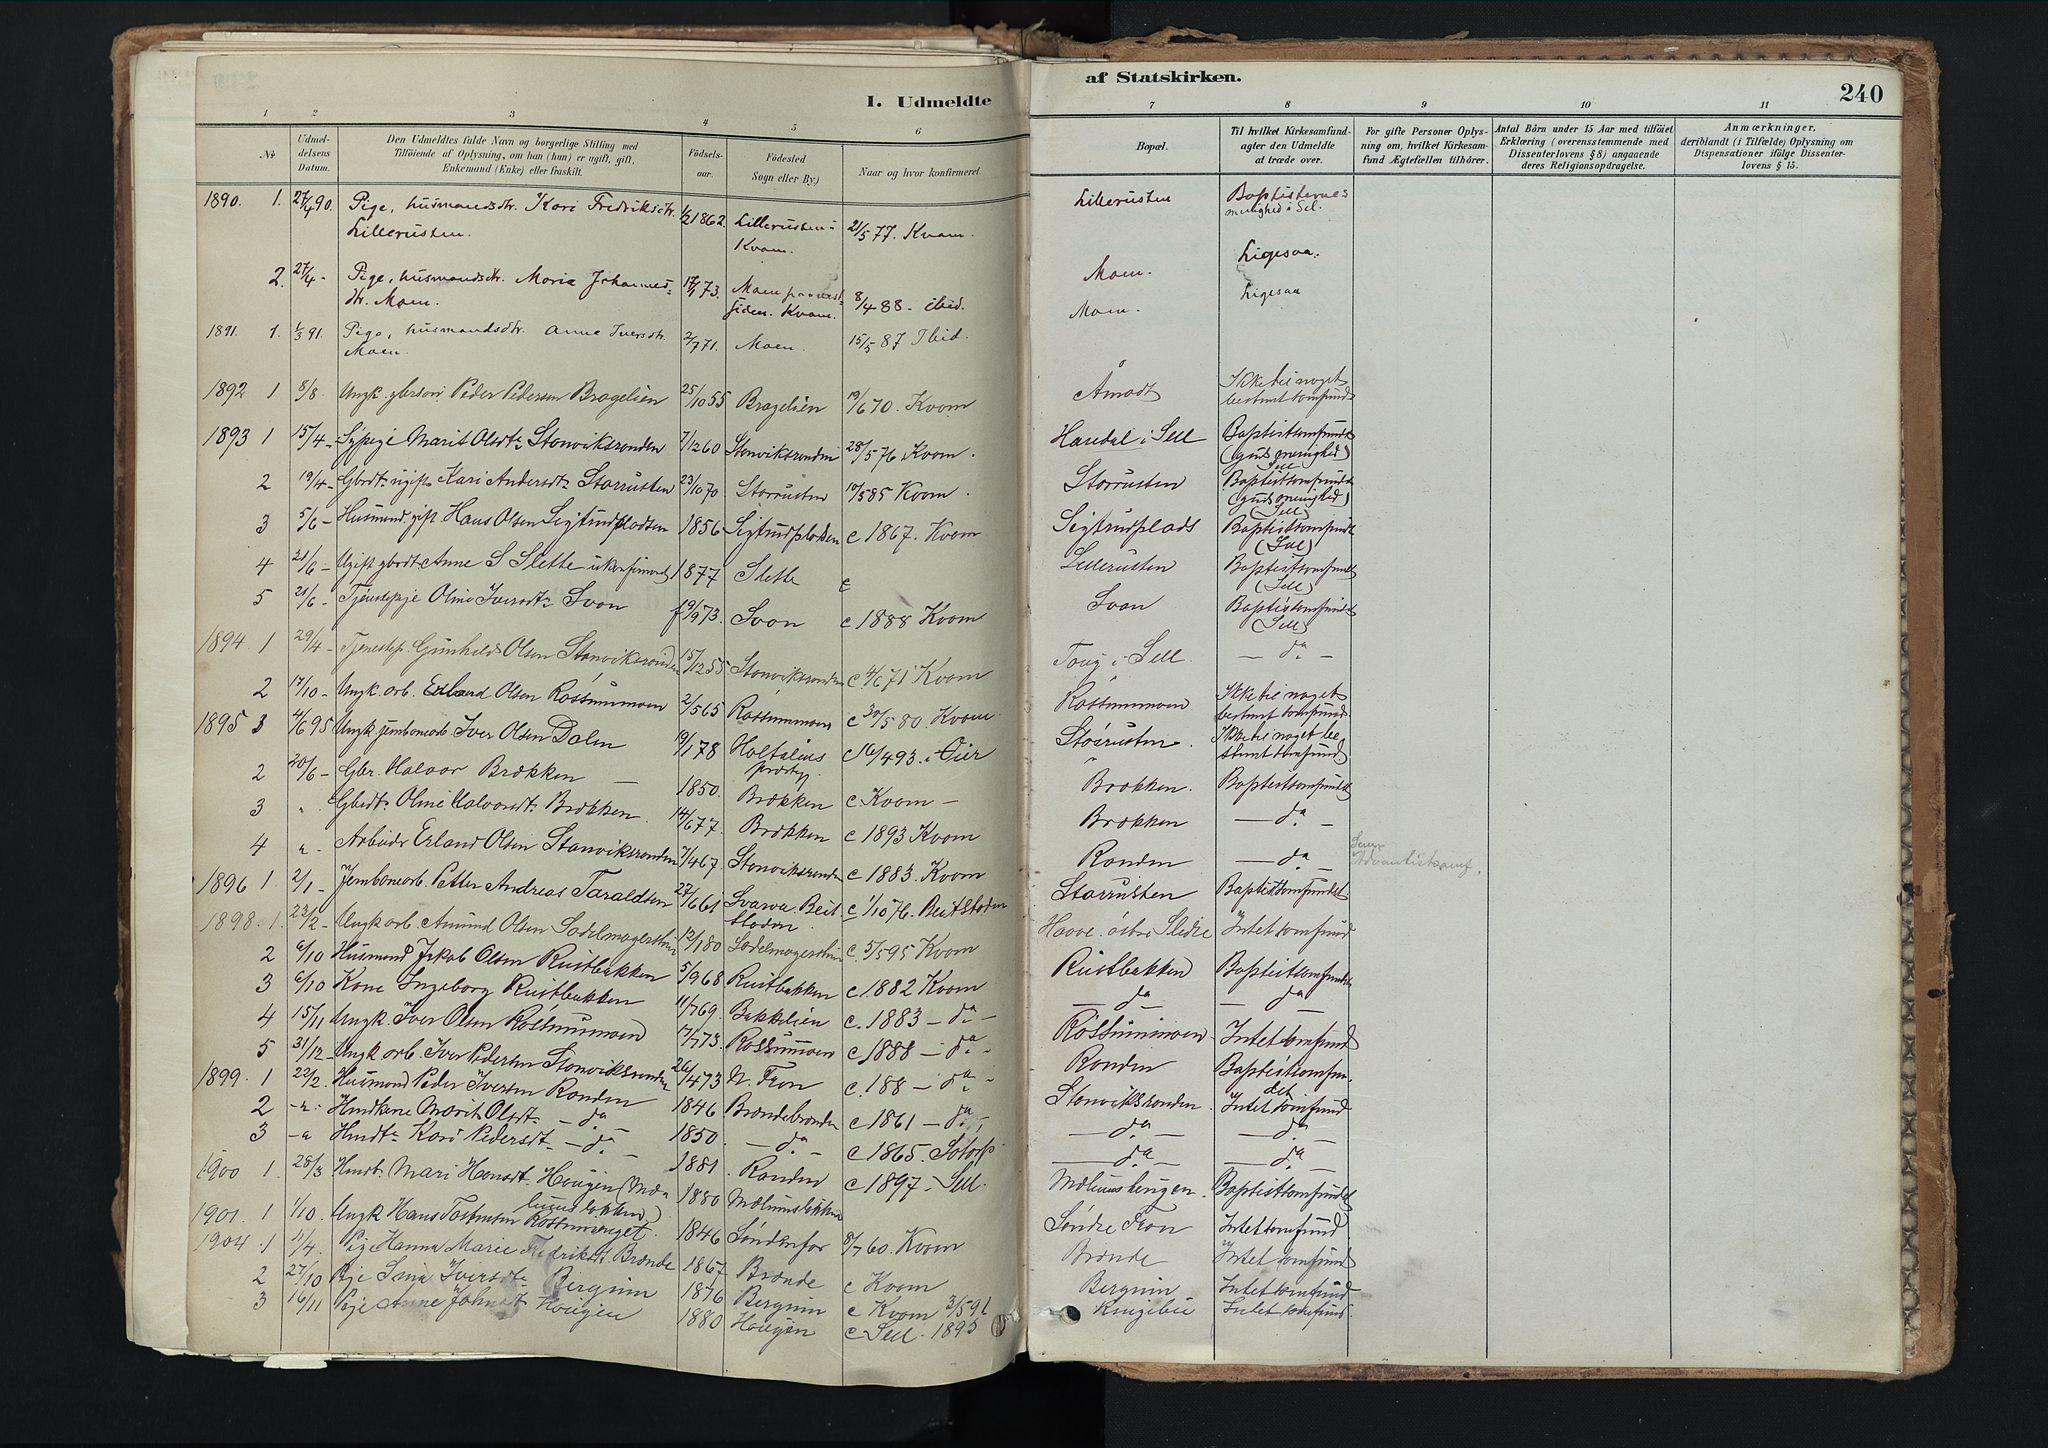 SAH, Nord-Fron prestekontor, Ministerialbok nr. 3, 1884-1914, s. 240